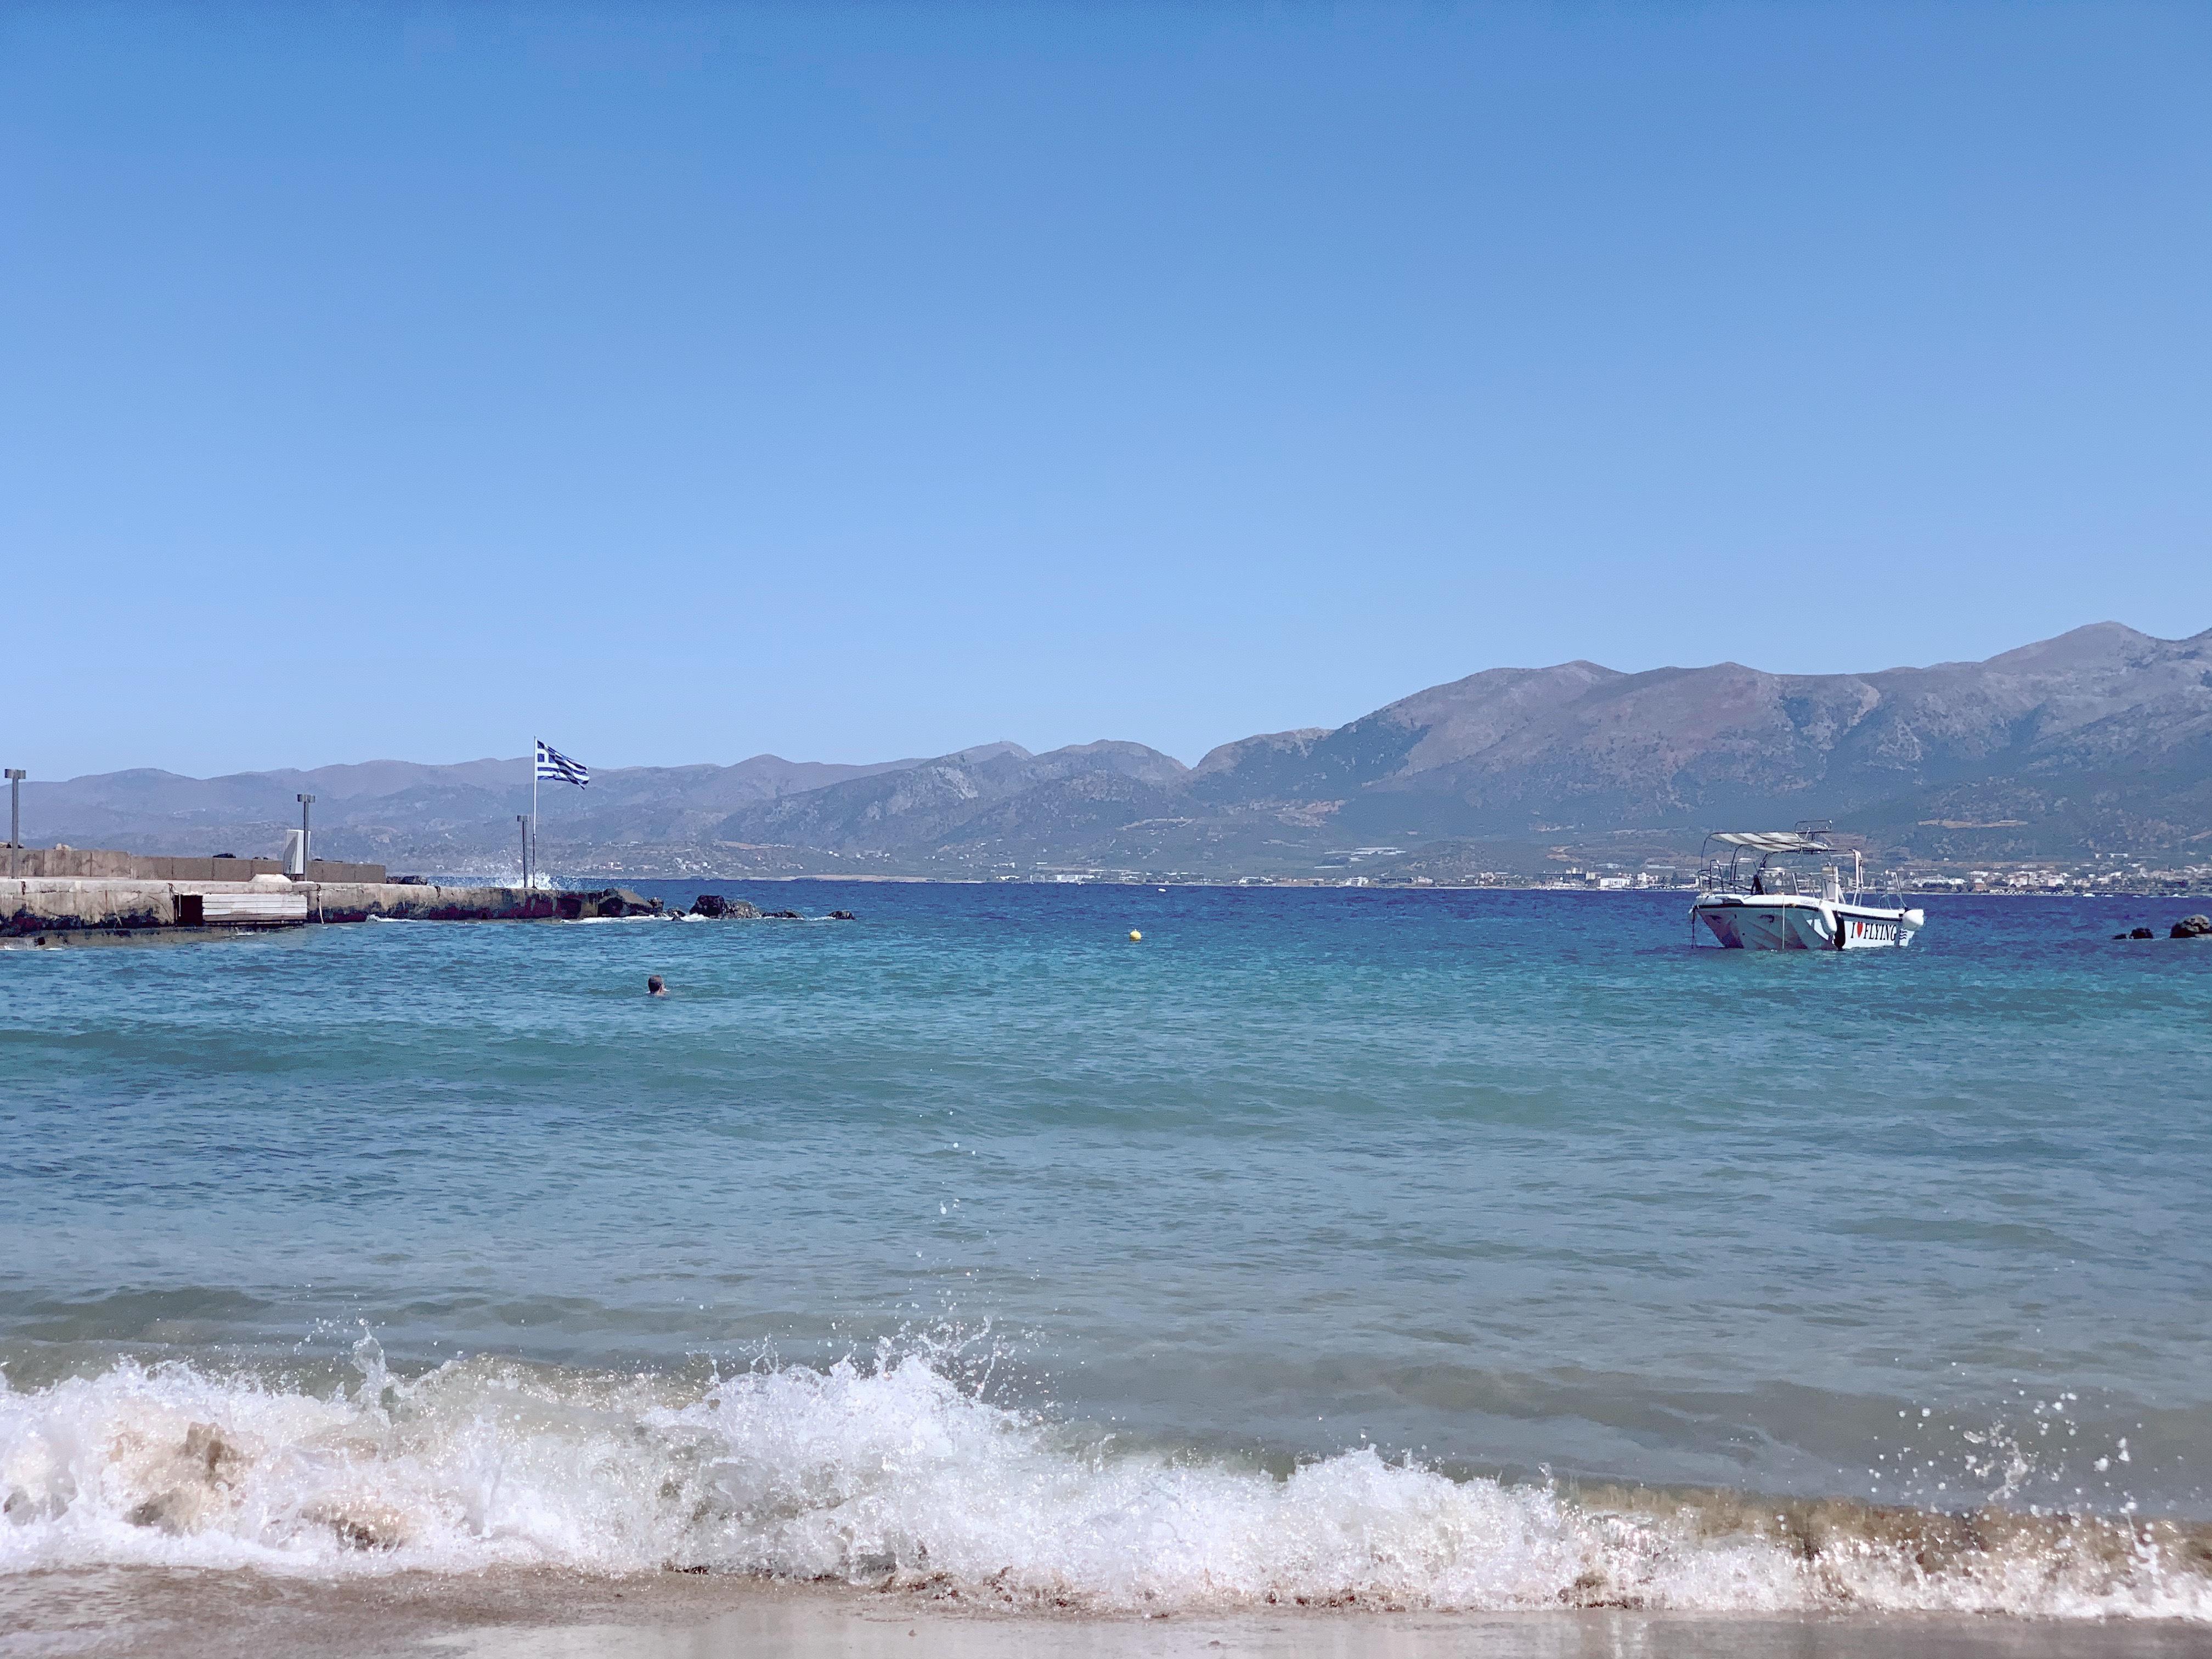 acs 0123 - Babymoon in Greece